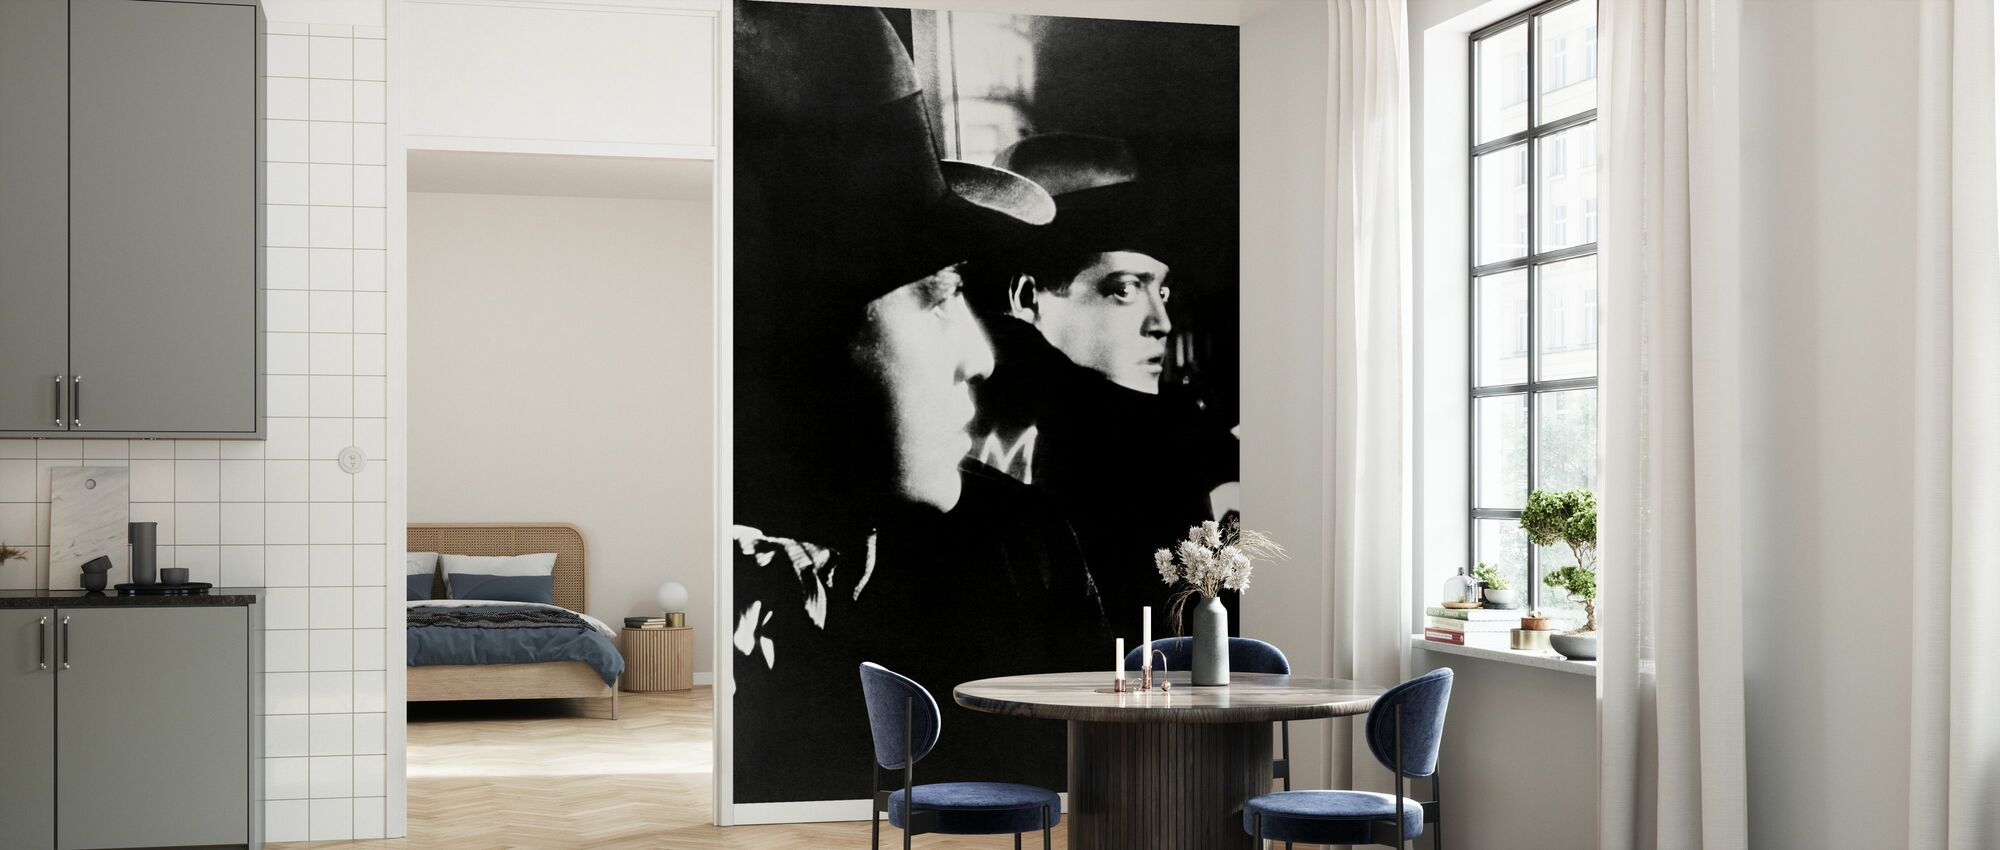 M - Peter Lorre - Wallpaper - Kitchen